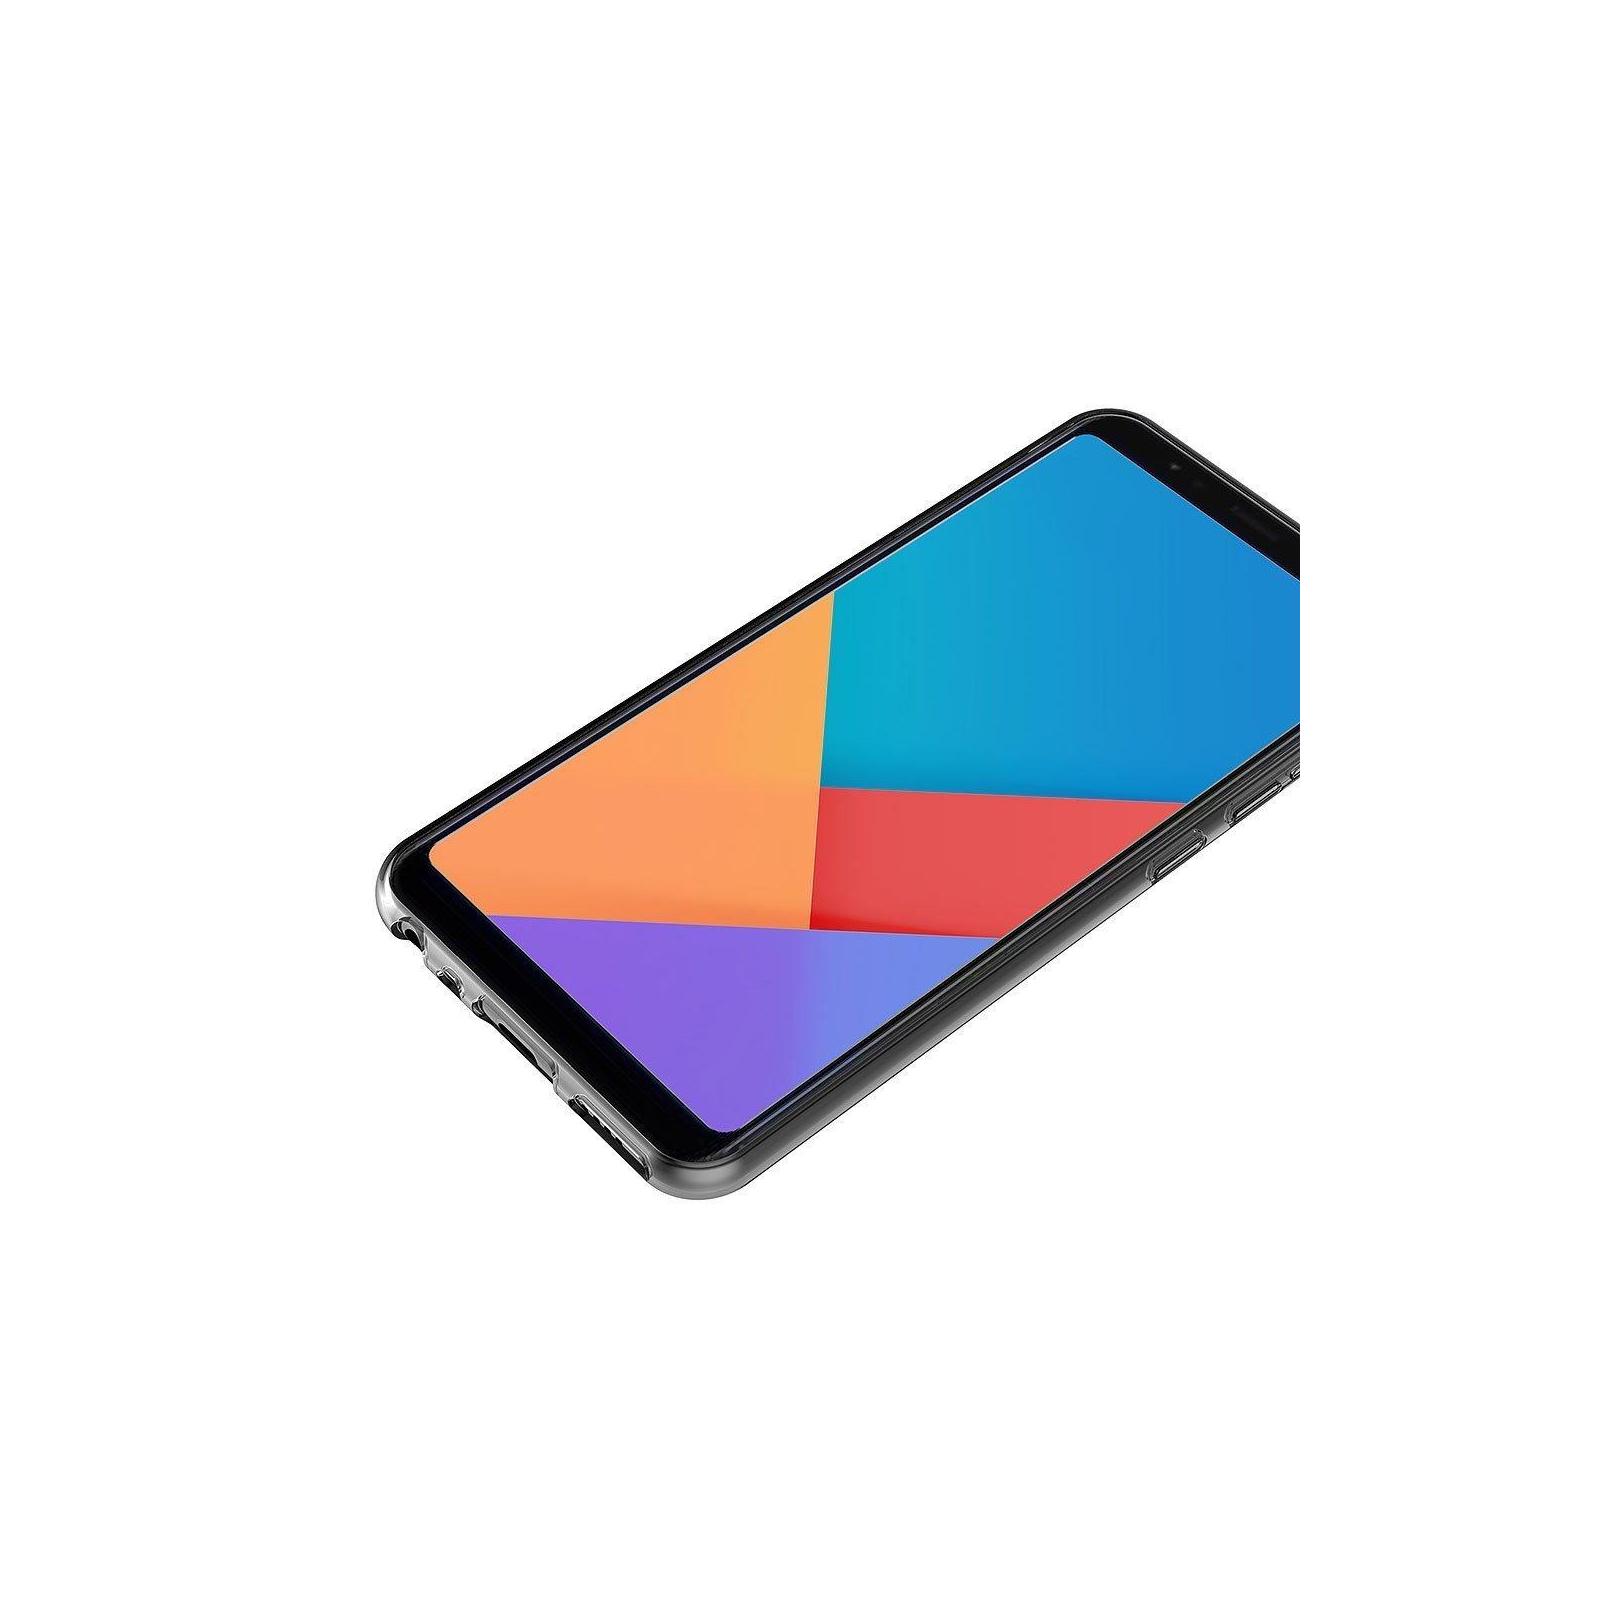 Чехол для моб. телефона Laudtec для Xiaomi Redmi Note 5 Pro Clear tpu (Transperent) (LC-XRN5P) изображение 5